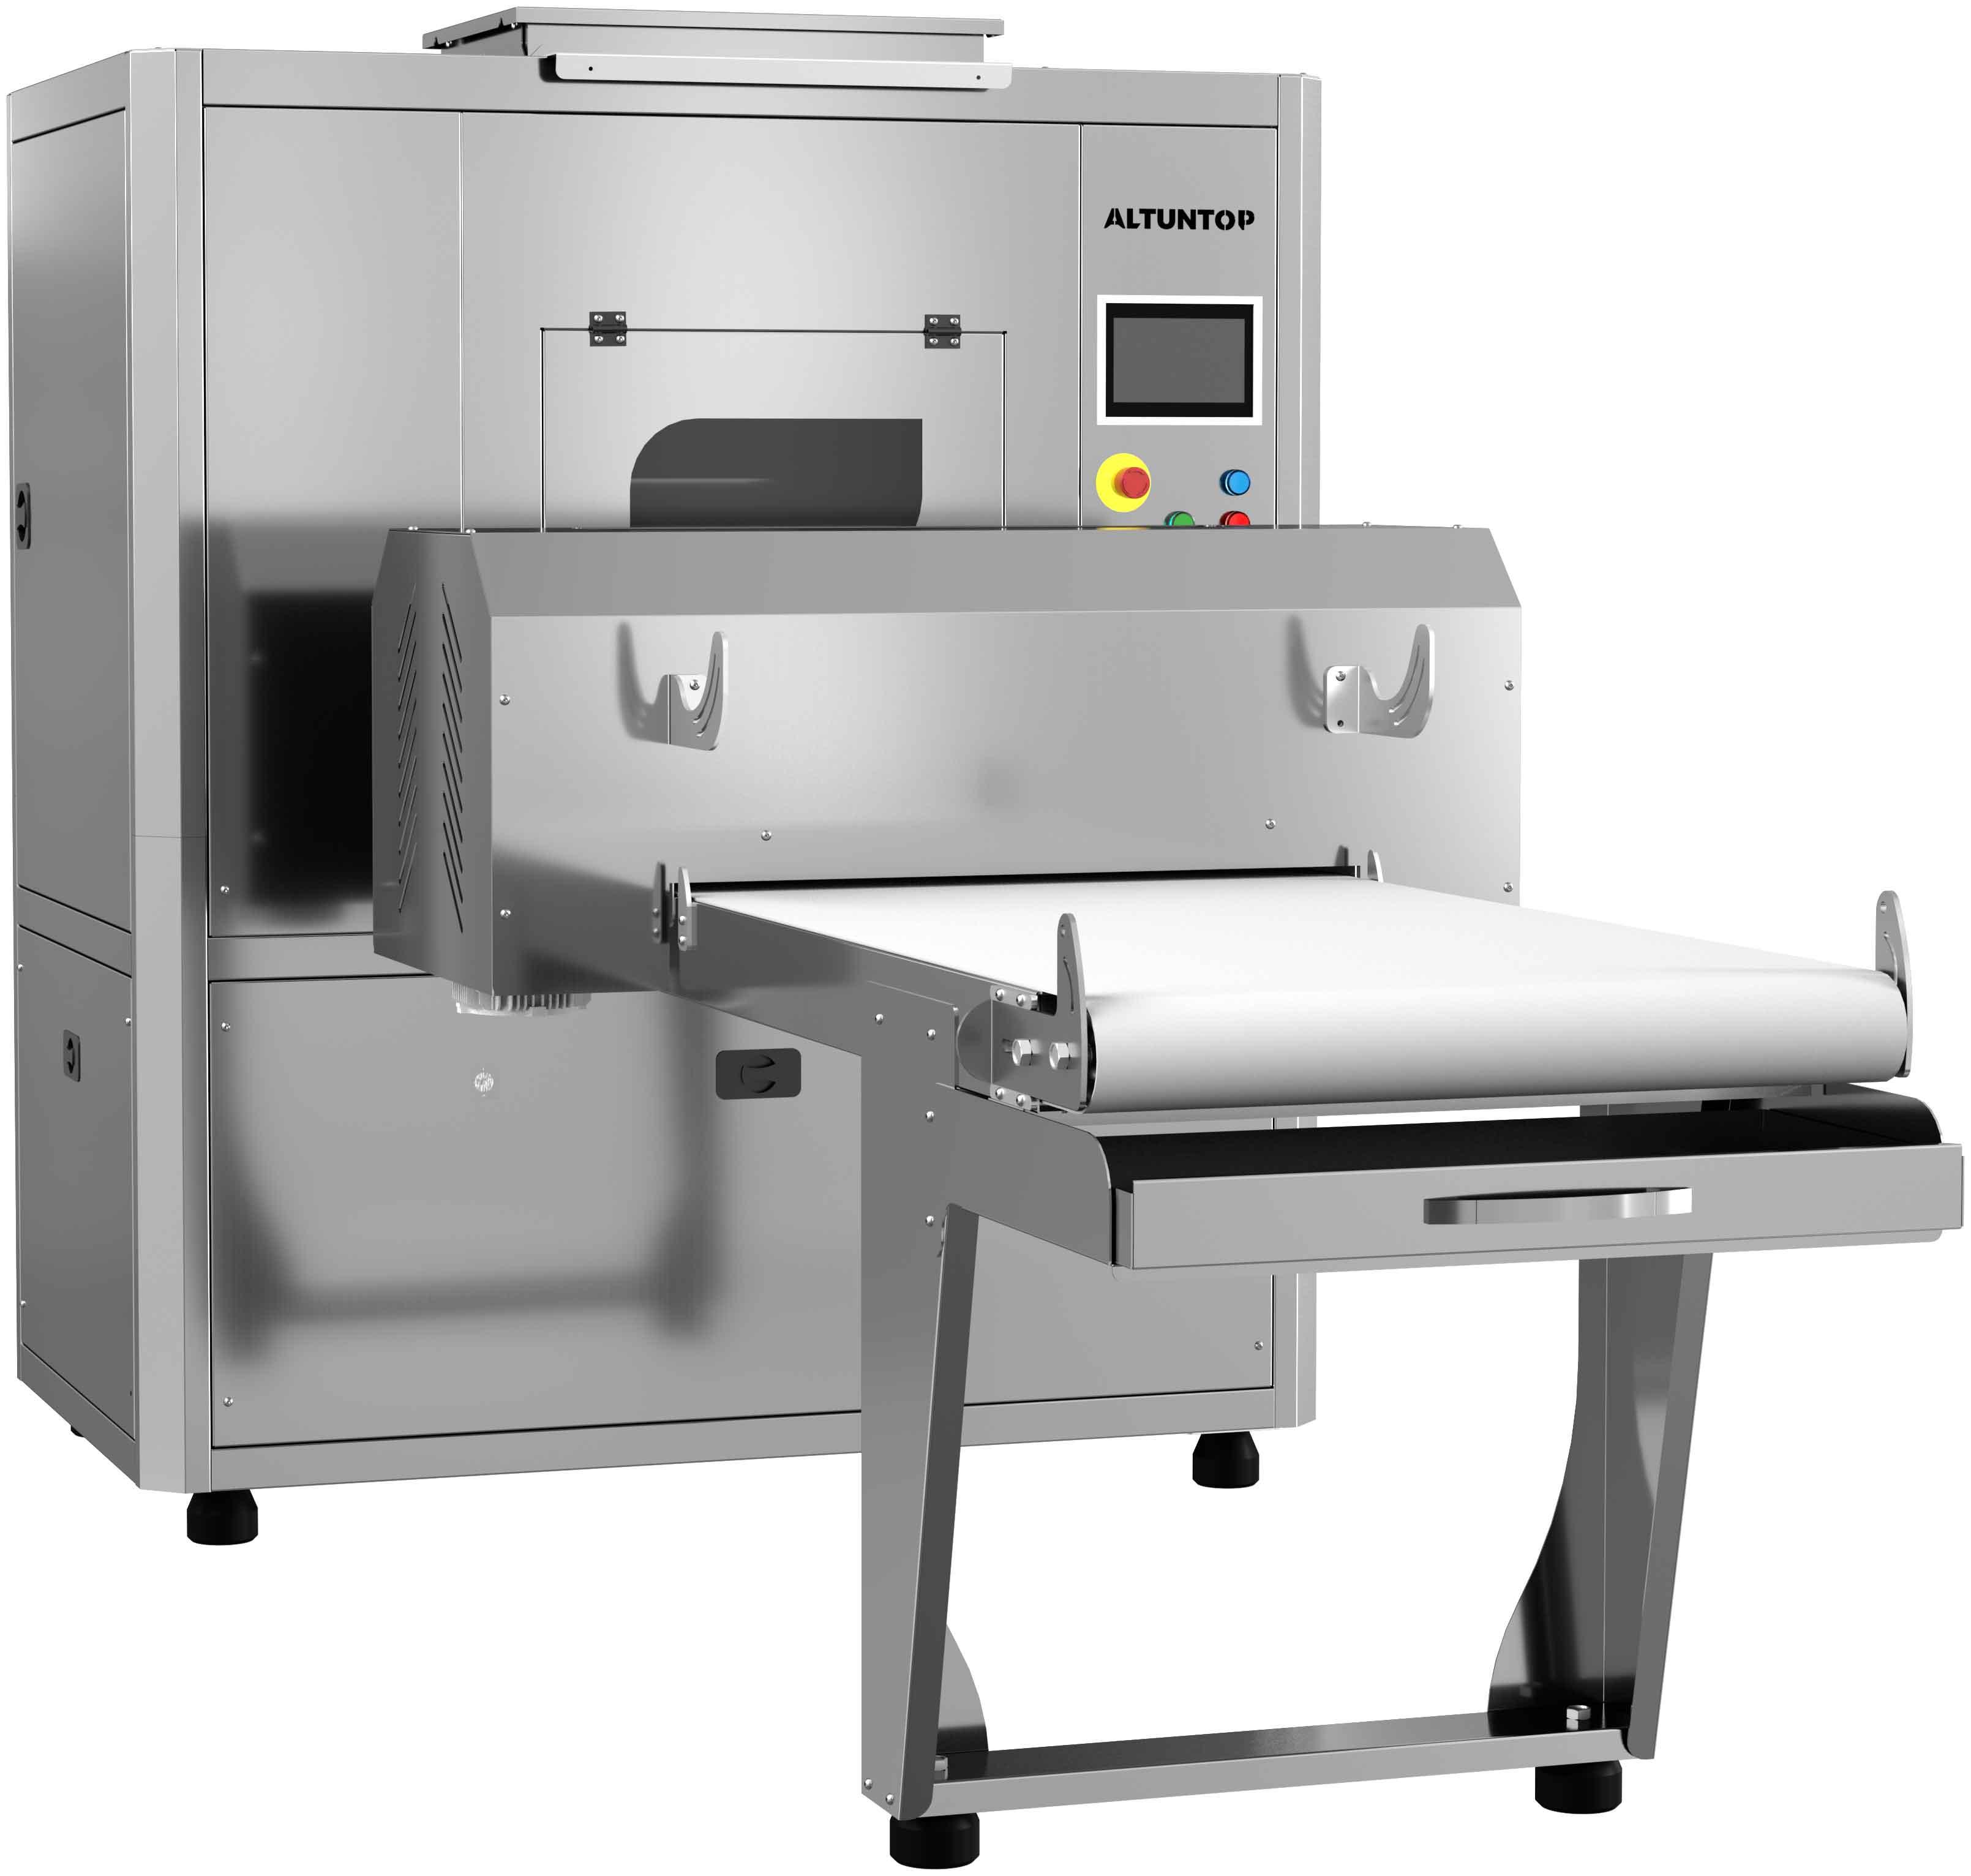 BAKLAVA MACHINE